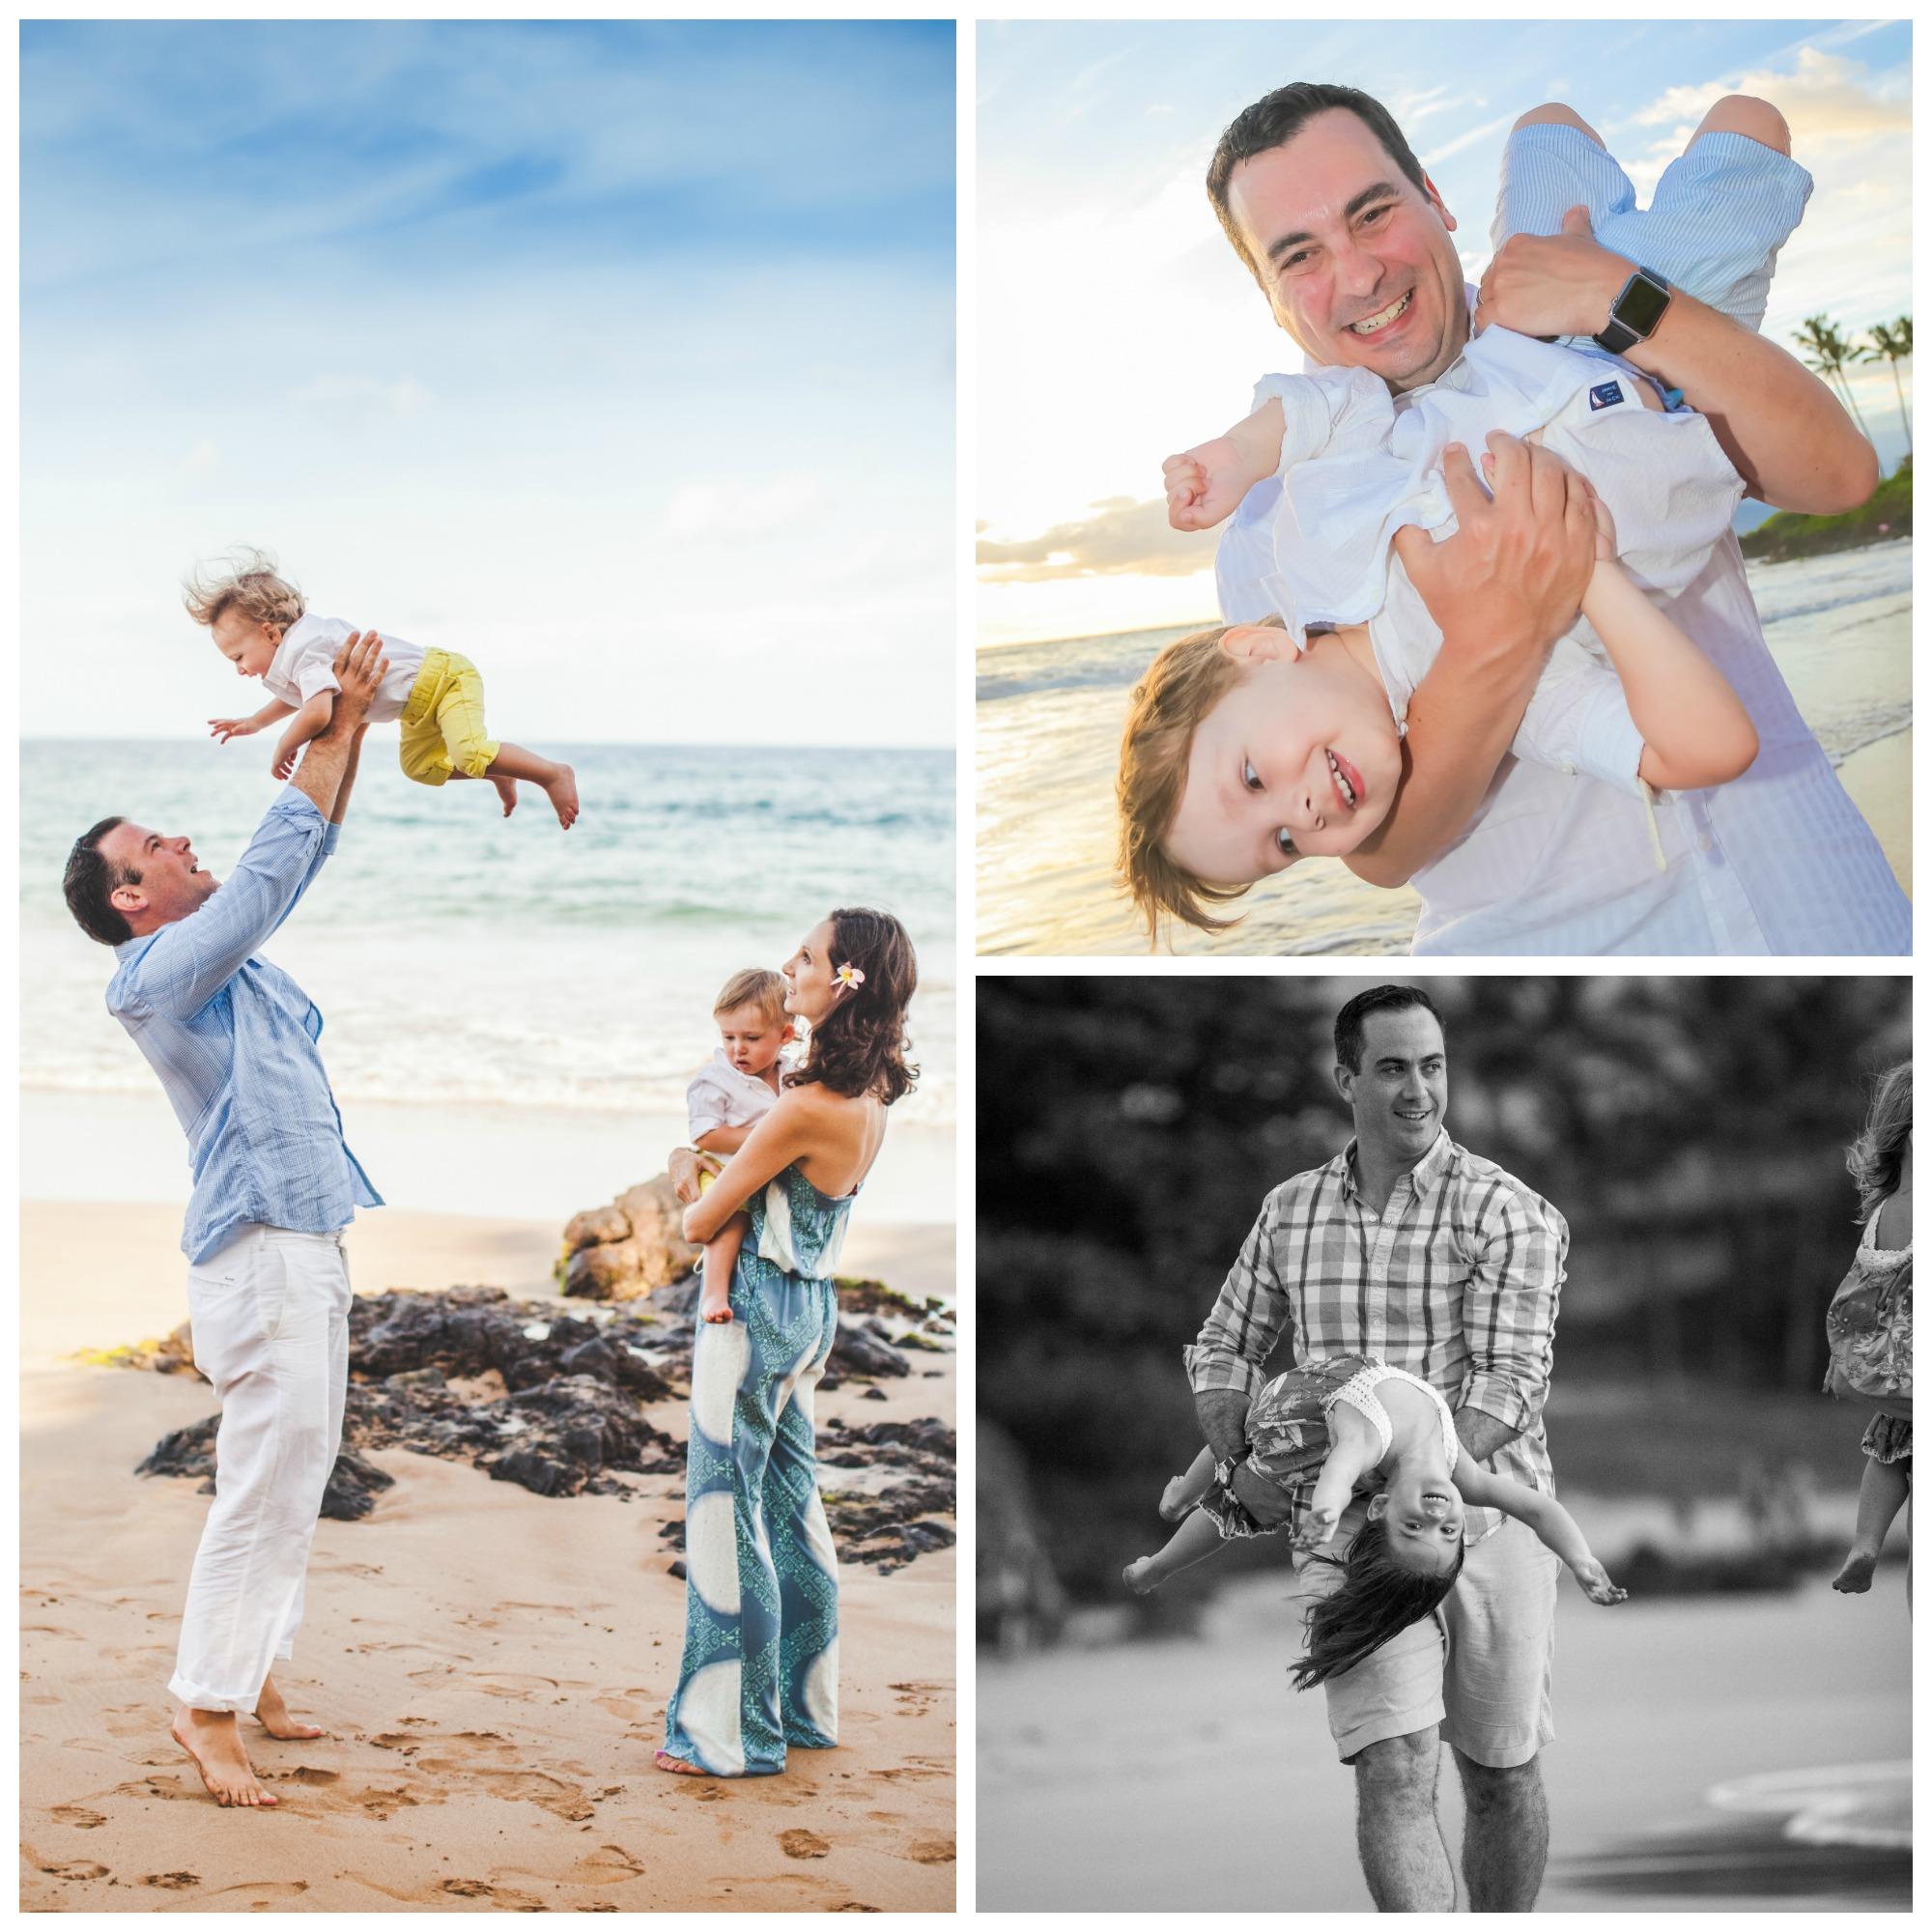 Pacific Dream Photography - Hawaii Photographer - Portrait Photographer - Family Photographer- Maui Photographer - Maui Beach Photos 2